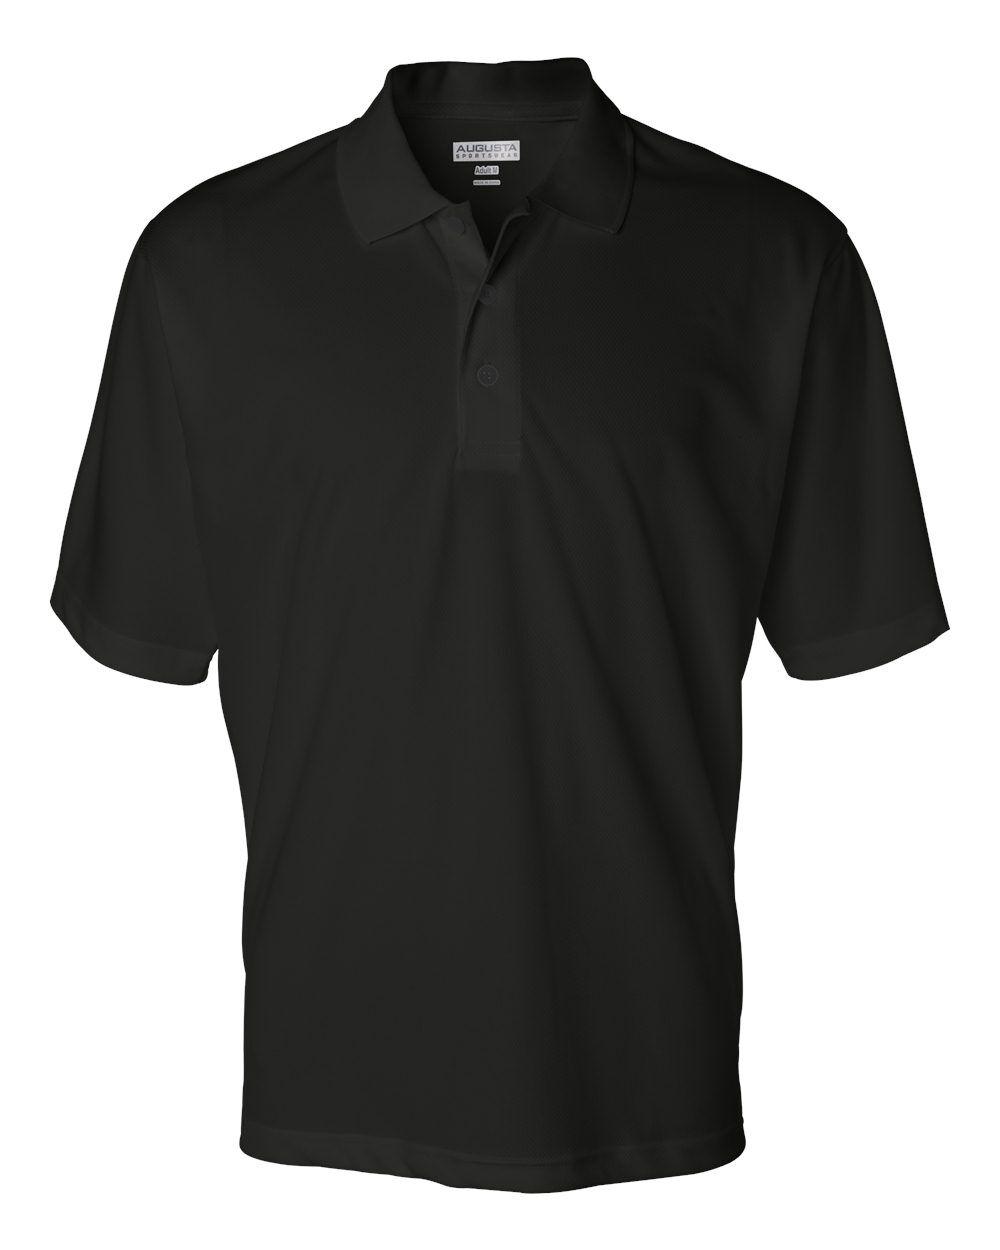 Augusta Sportswear - Wicking Mesh Sport Shirt - 5095 - Black - X-Large